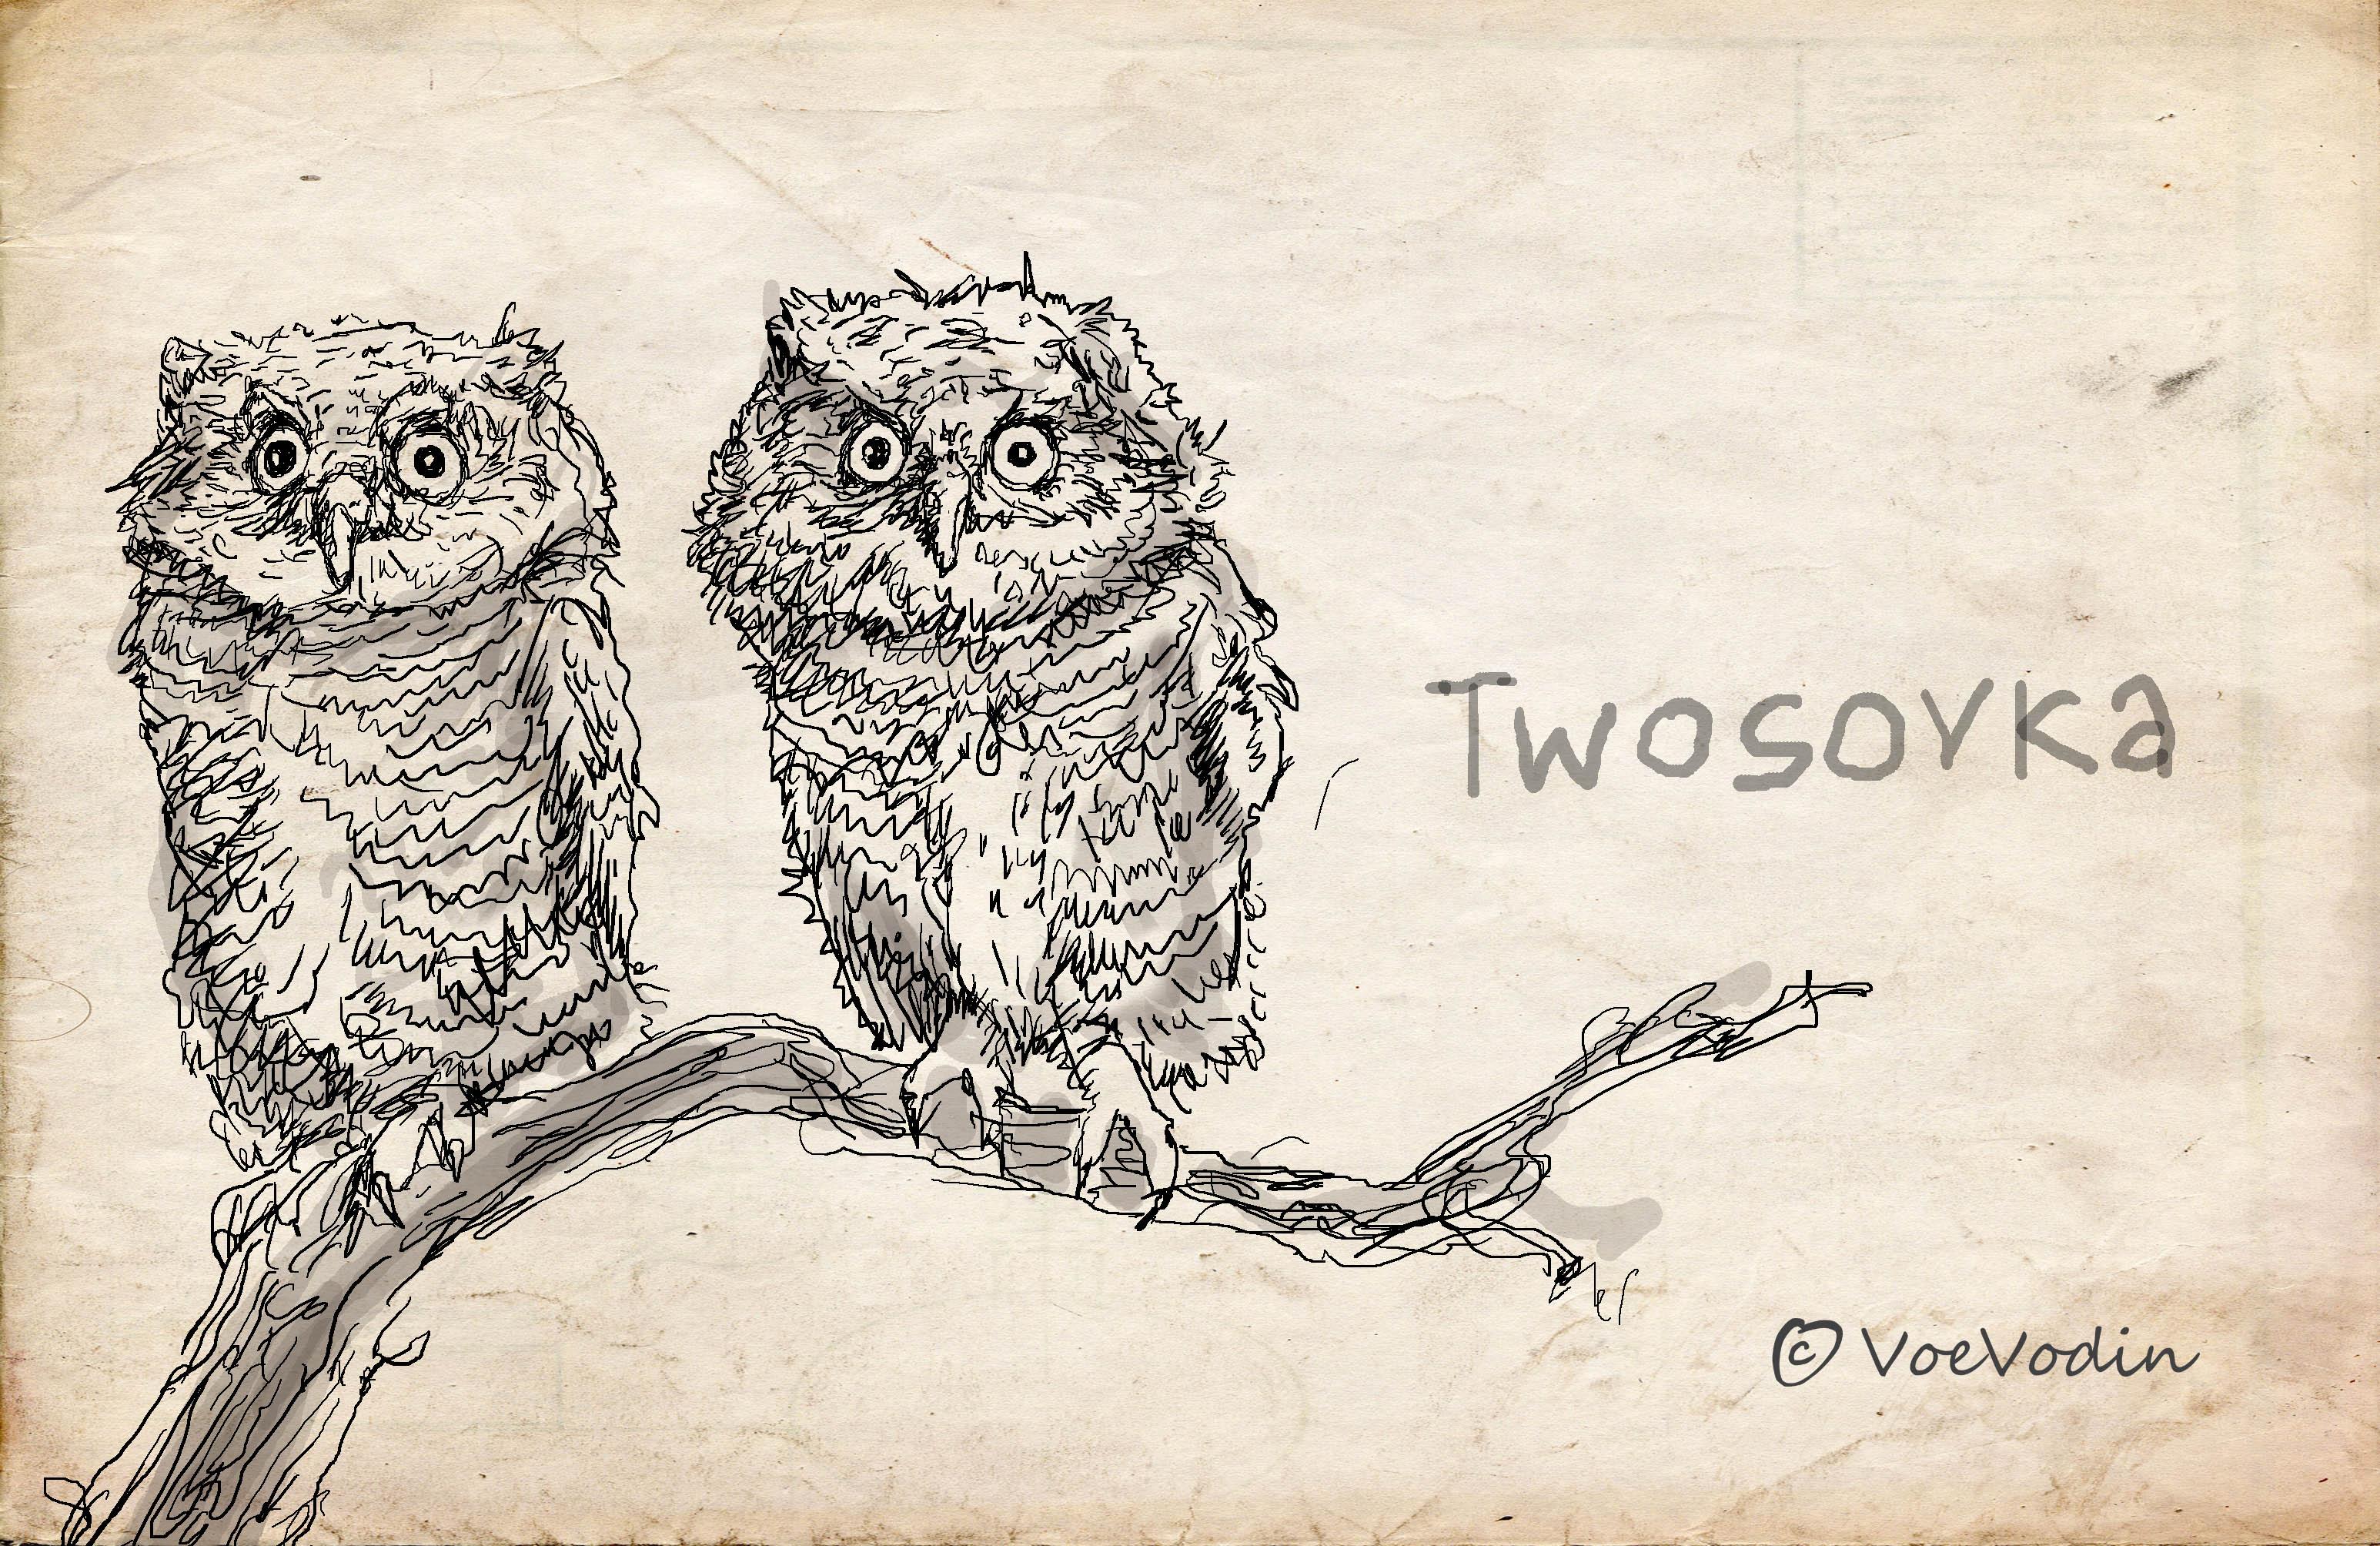 twosovka